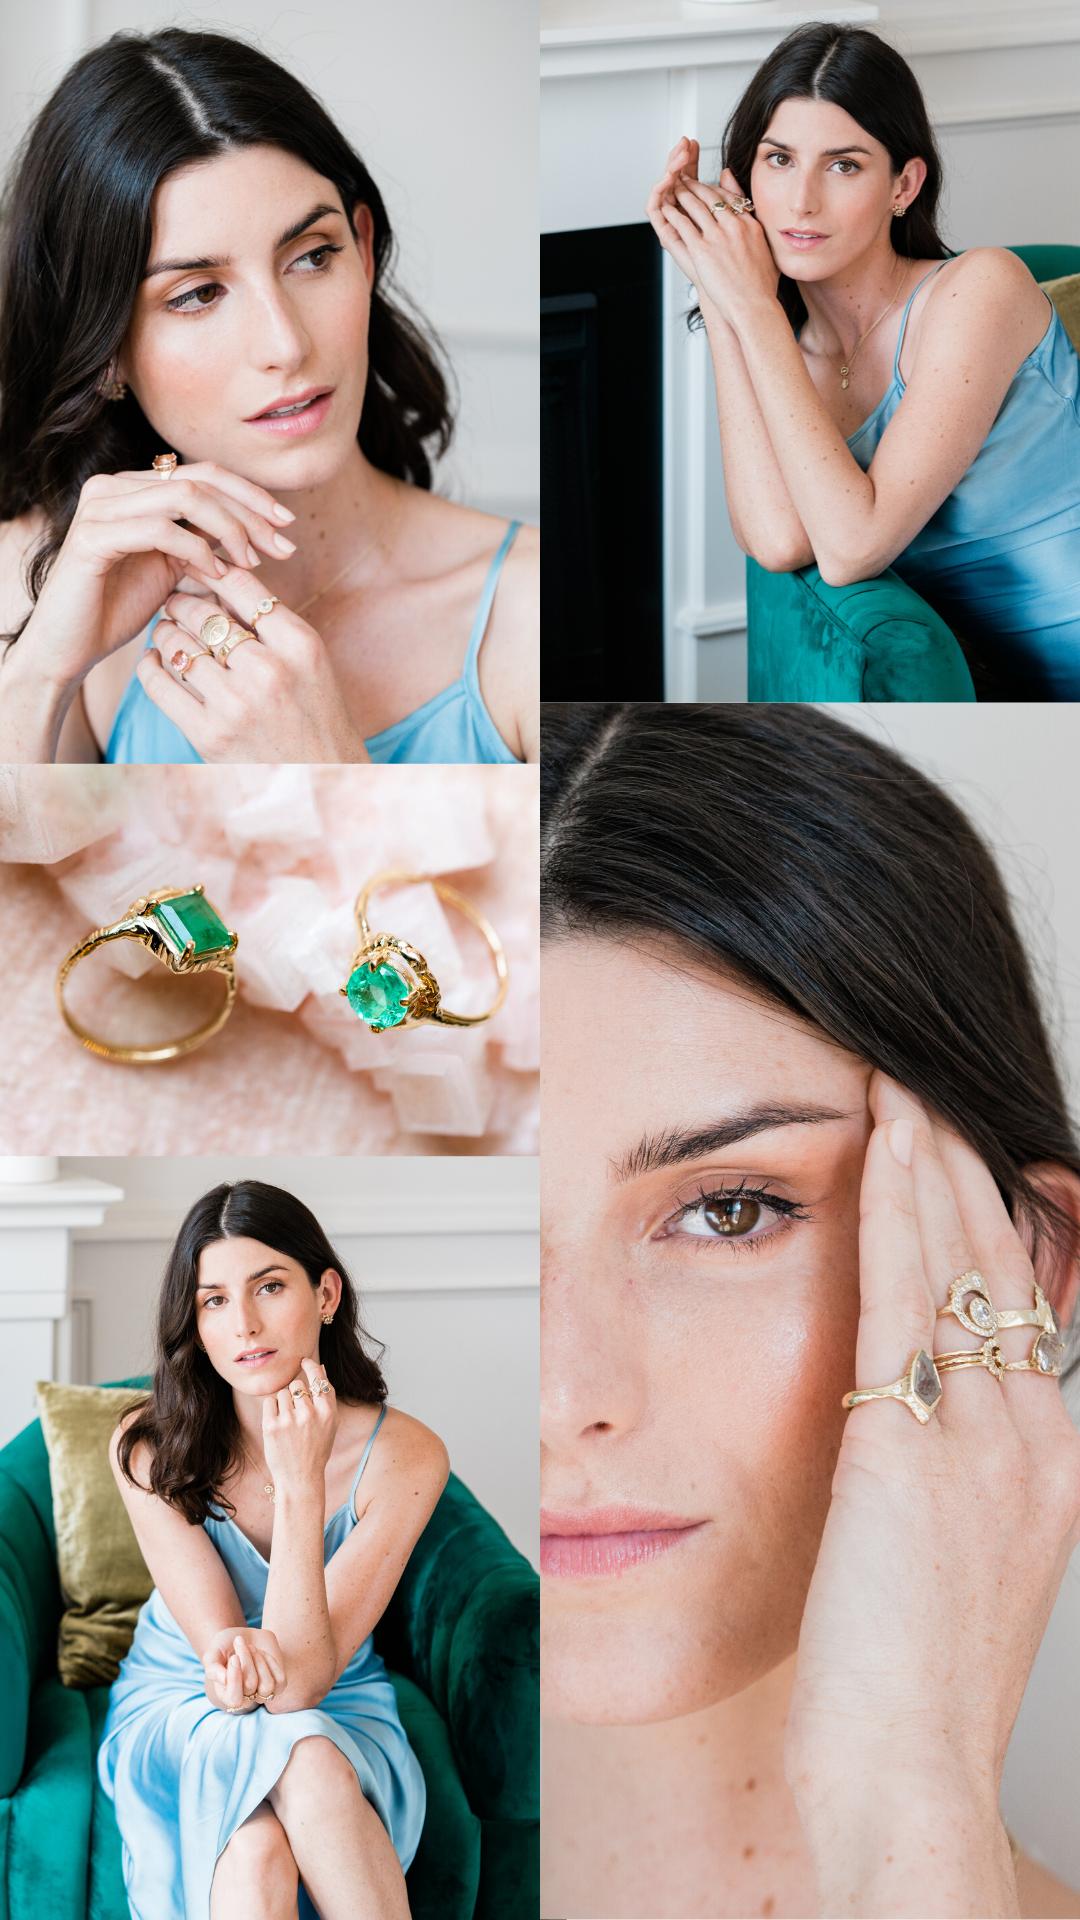 Los Angeles Jewelry Shoot | Communion by Joy | California Jewelry Photographer | Communion by Joy Photoshoot | Los Angeles Photographer | Urban Jungle Studio Rental | Jewelry Photographer | Fashion Photographer | #communionbyjoy #jewelryphotoshoot #laphotographer @laurenlnewman